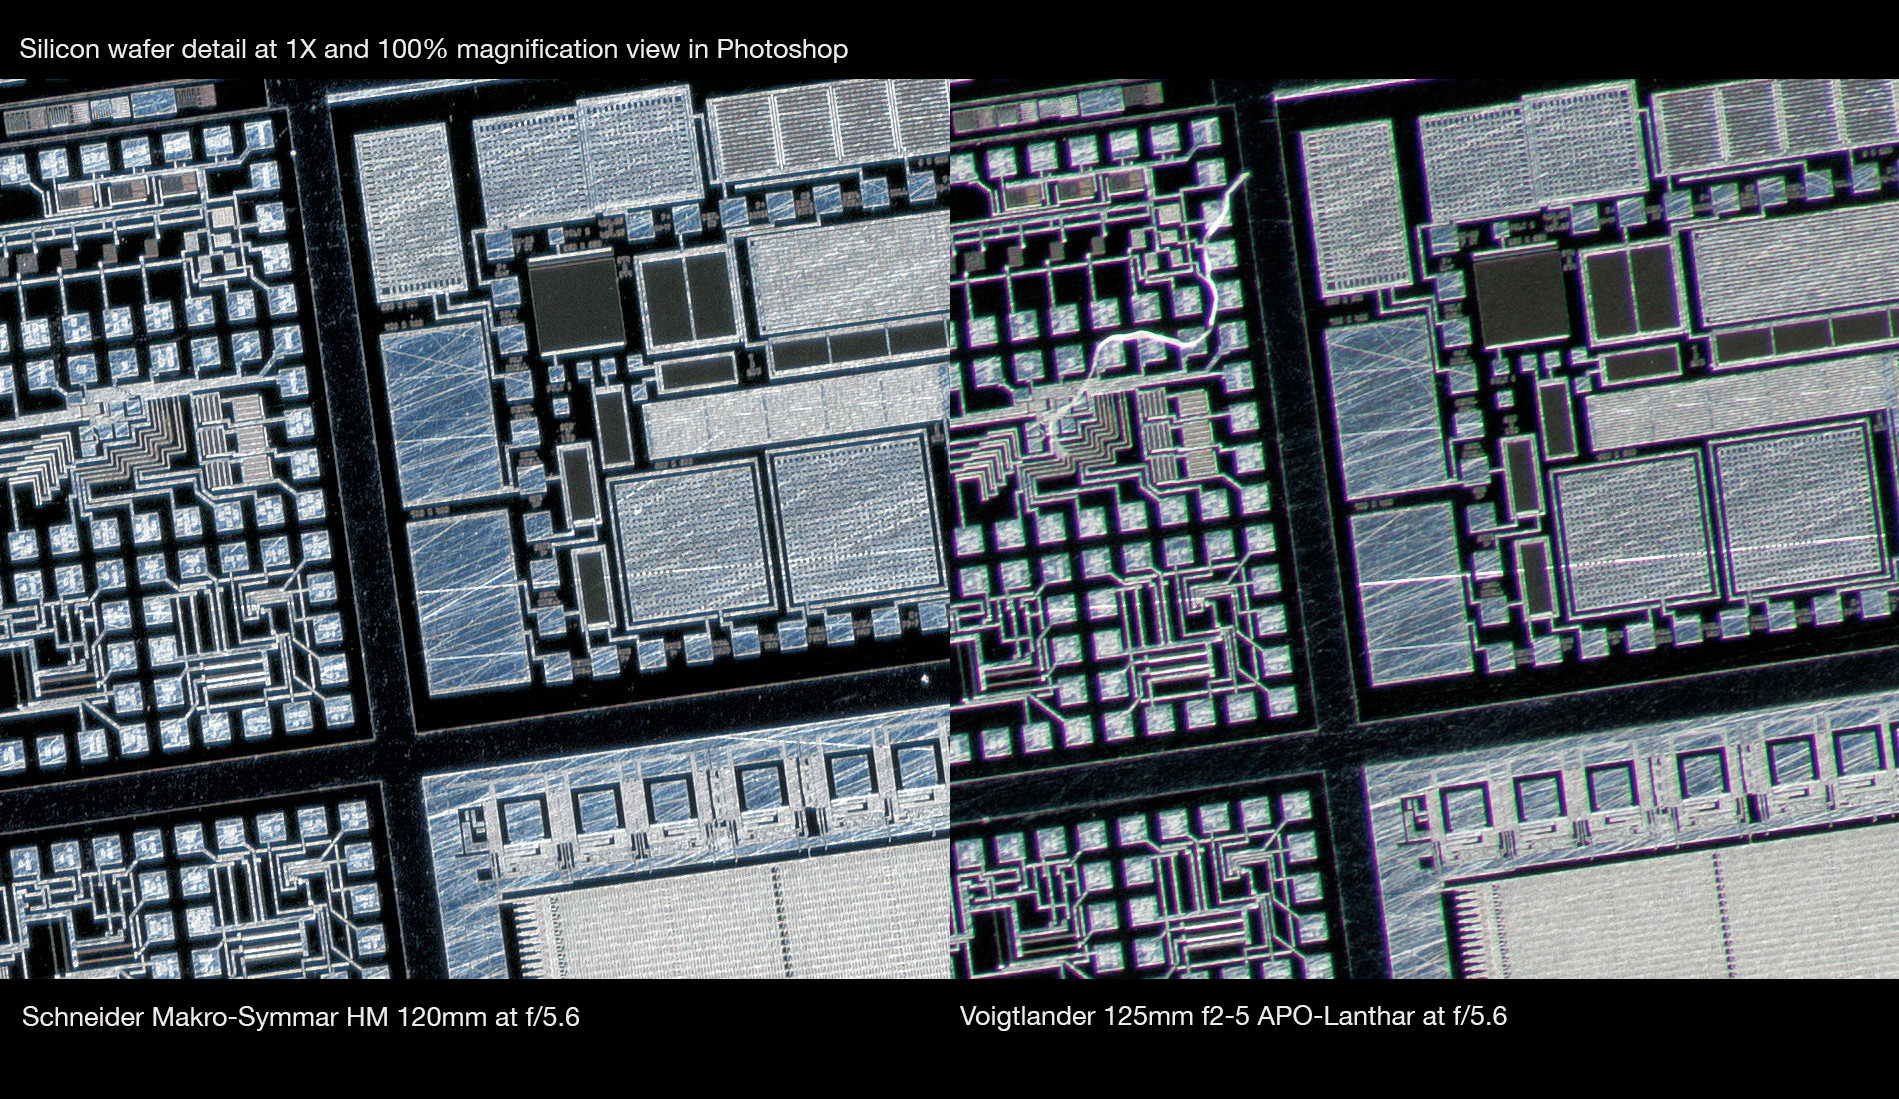 Schneider-Macro-Symmar-HM-120mm-vs-Voigtlander-125mm-APO-Lanthar-at-1X-corner-crop-Robert-OToole-Photography.JPG